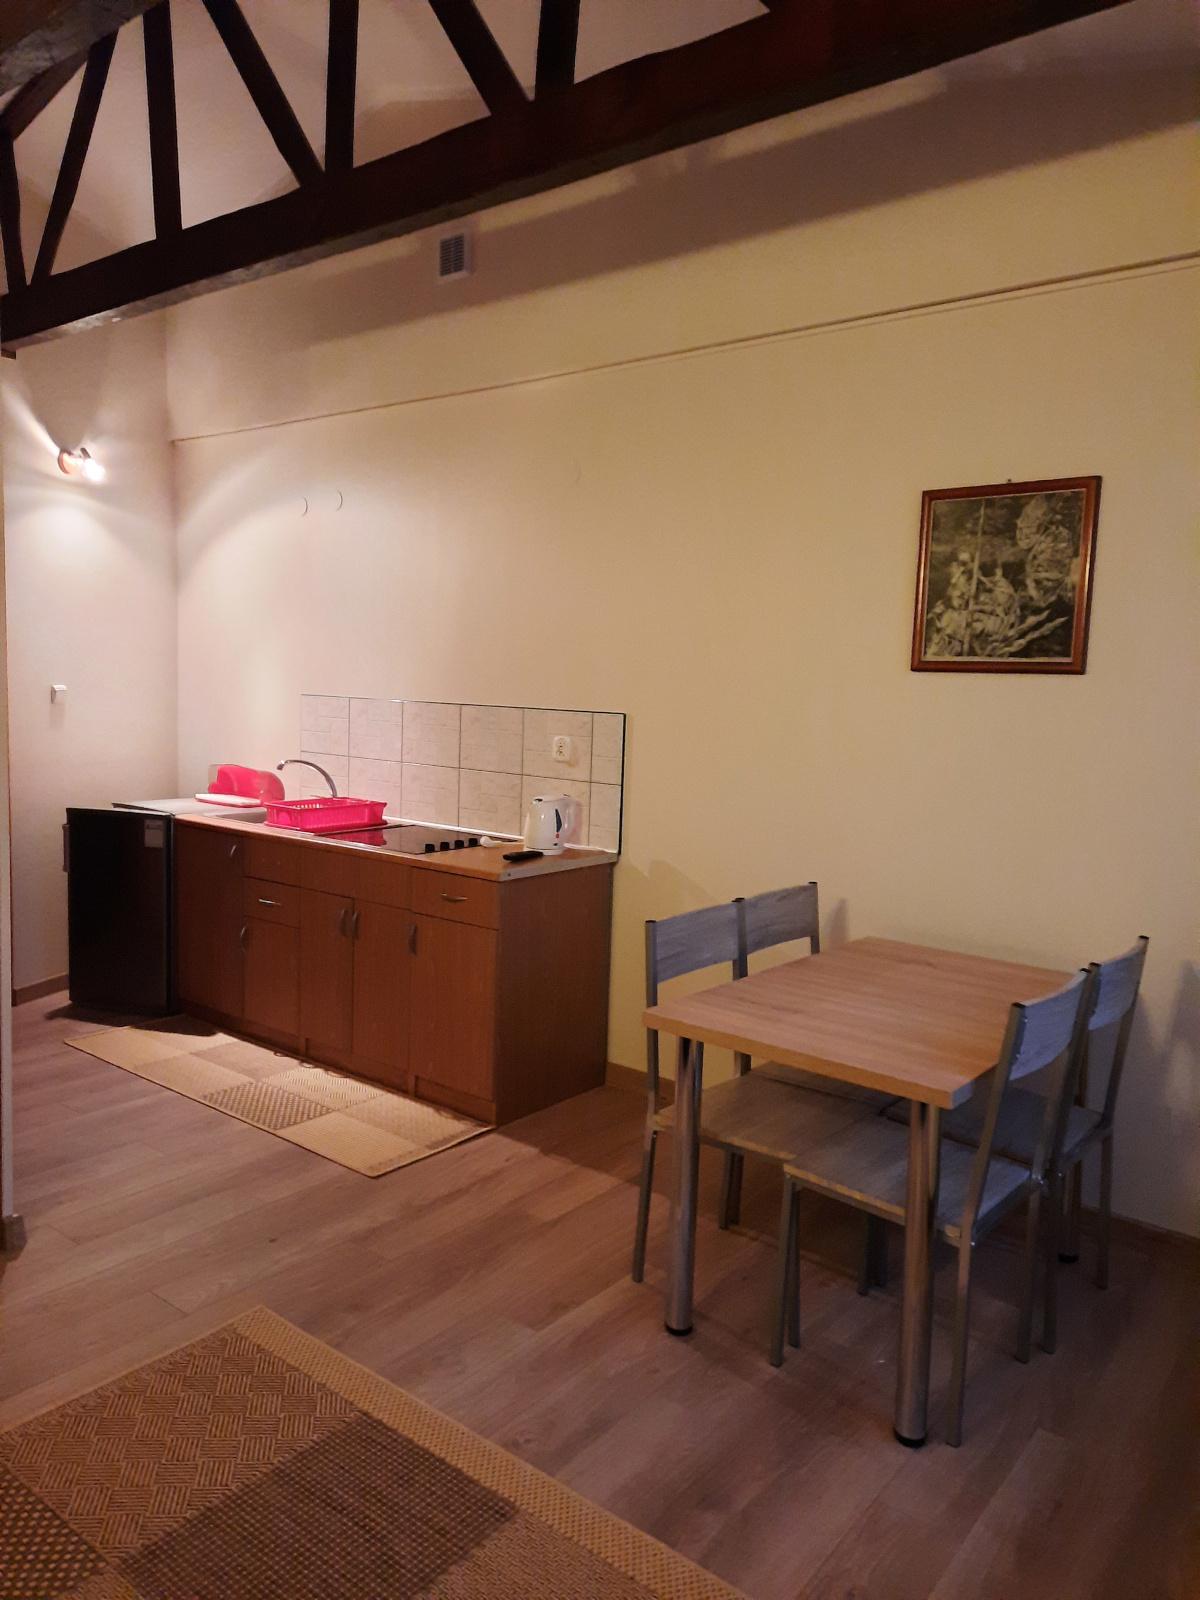 Studio 7 - aneks kuchenny